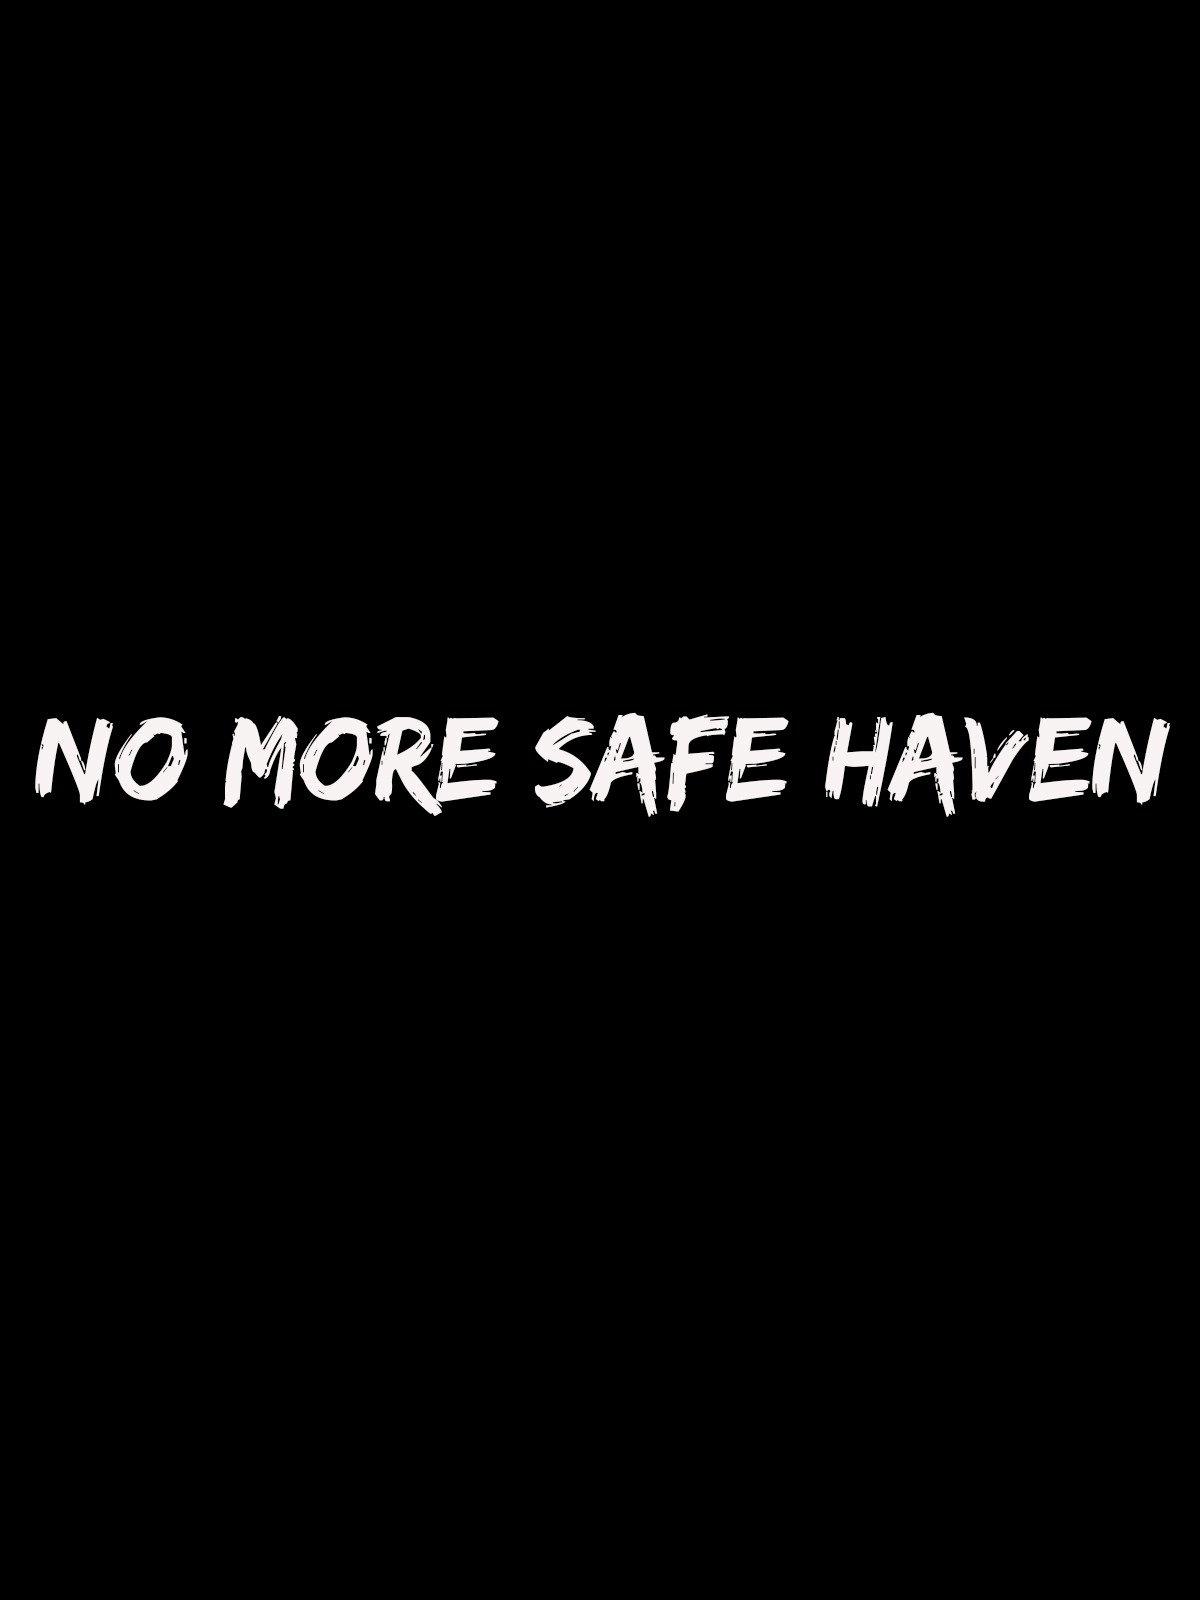 No More Safe Haven